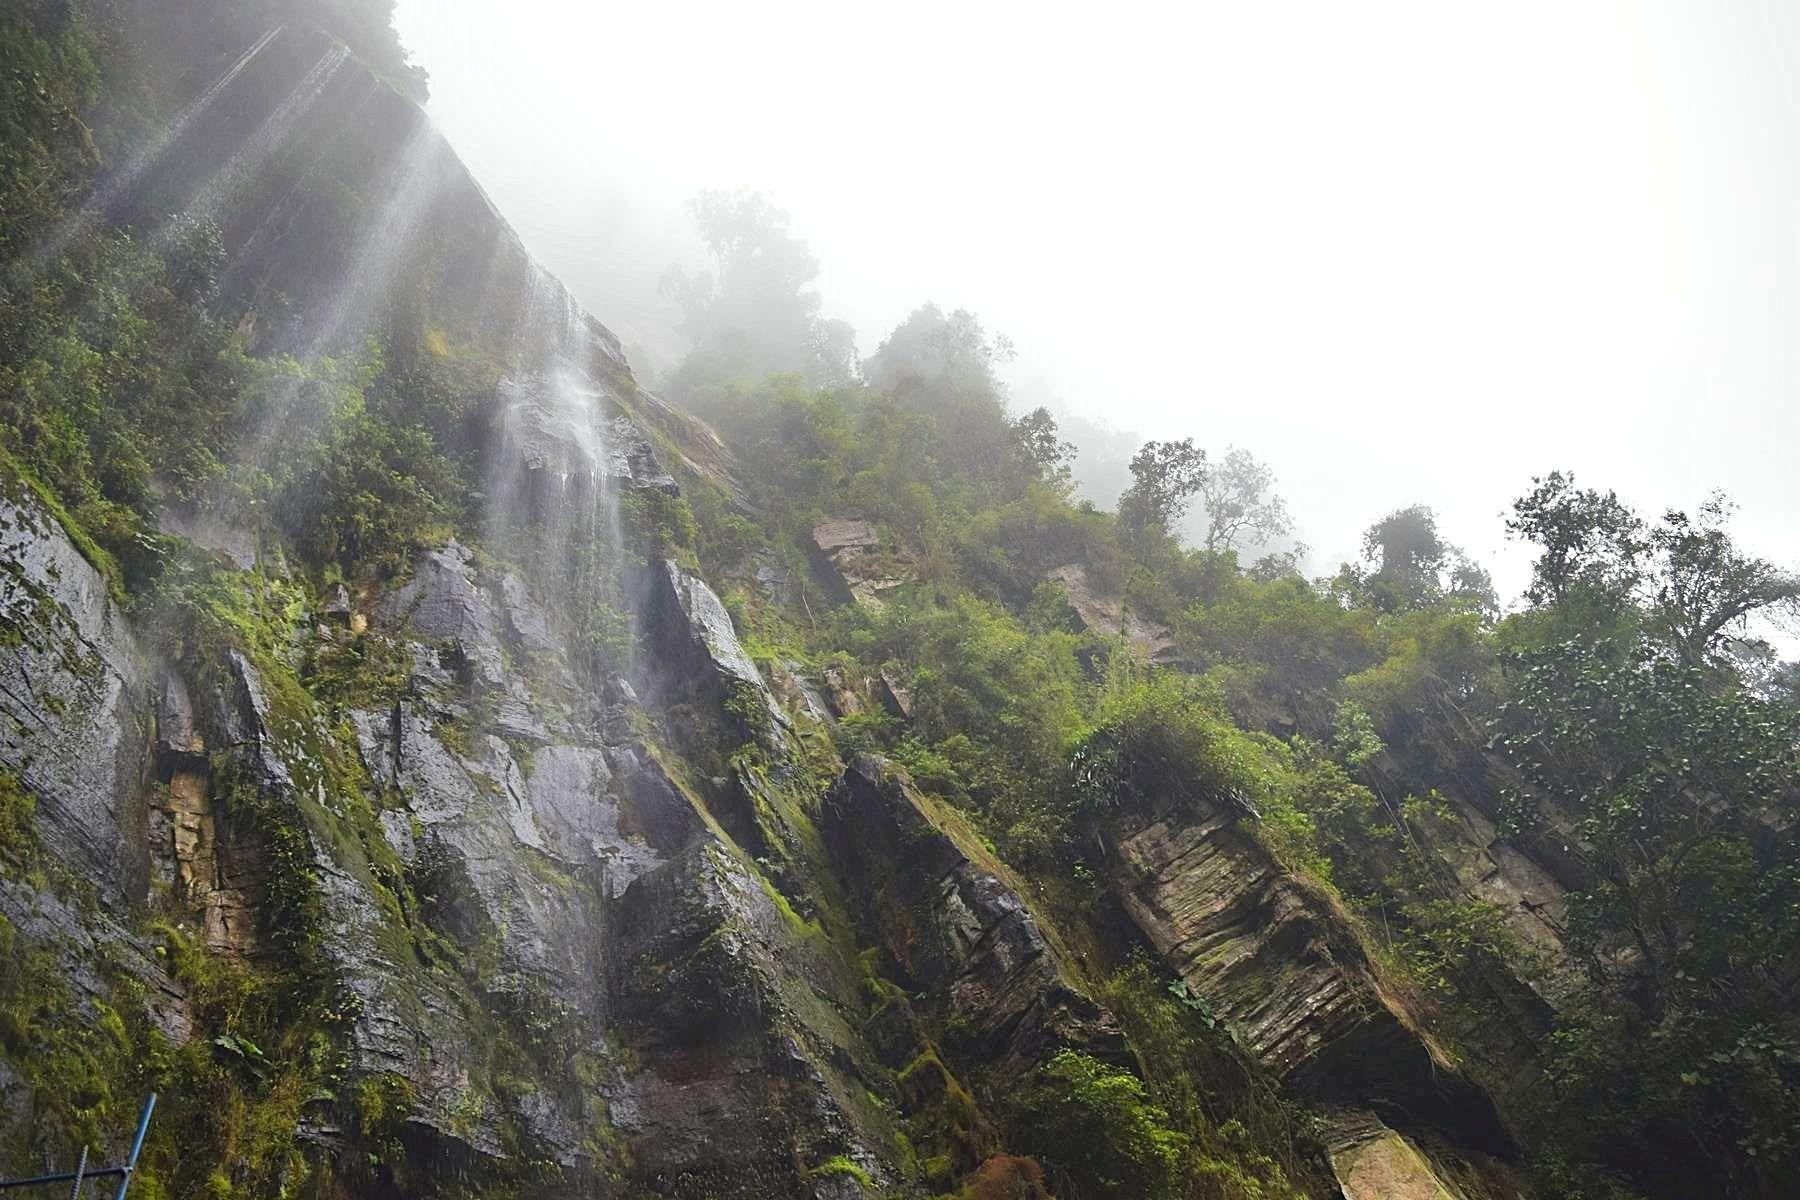 Hoogste waterval Colombia La Chorrera Choachí